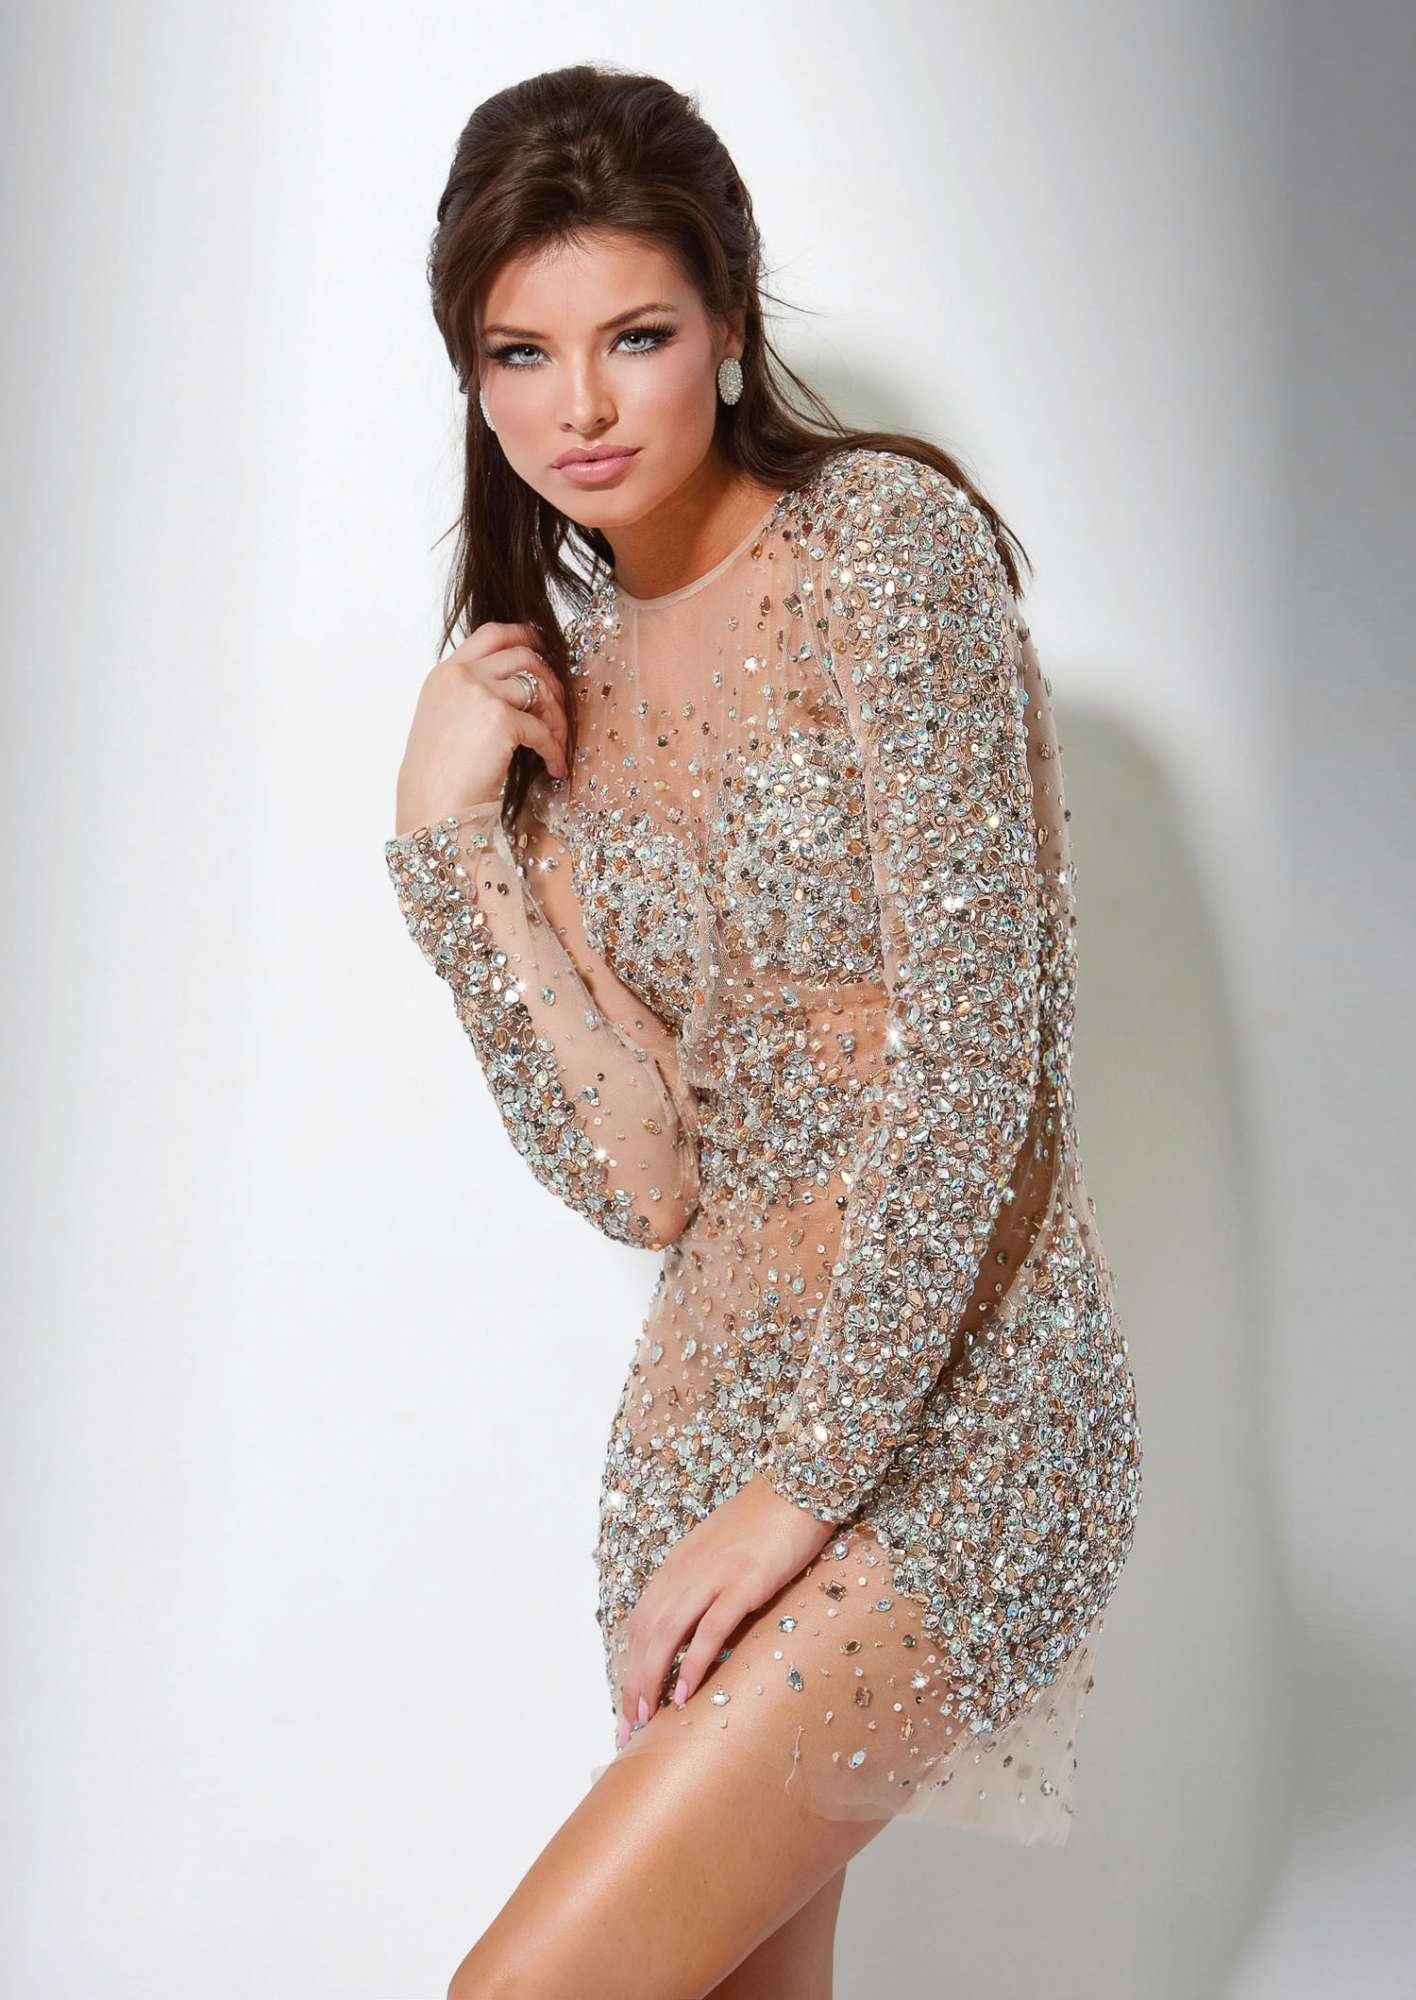 Jovani 7757 - Nude Beaded Sheer Sexy Dresses - RissyRoos.com